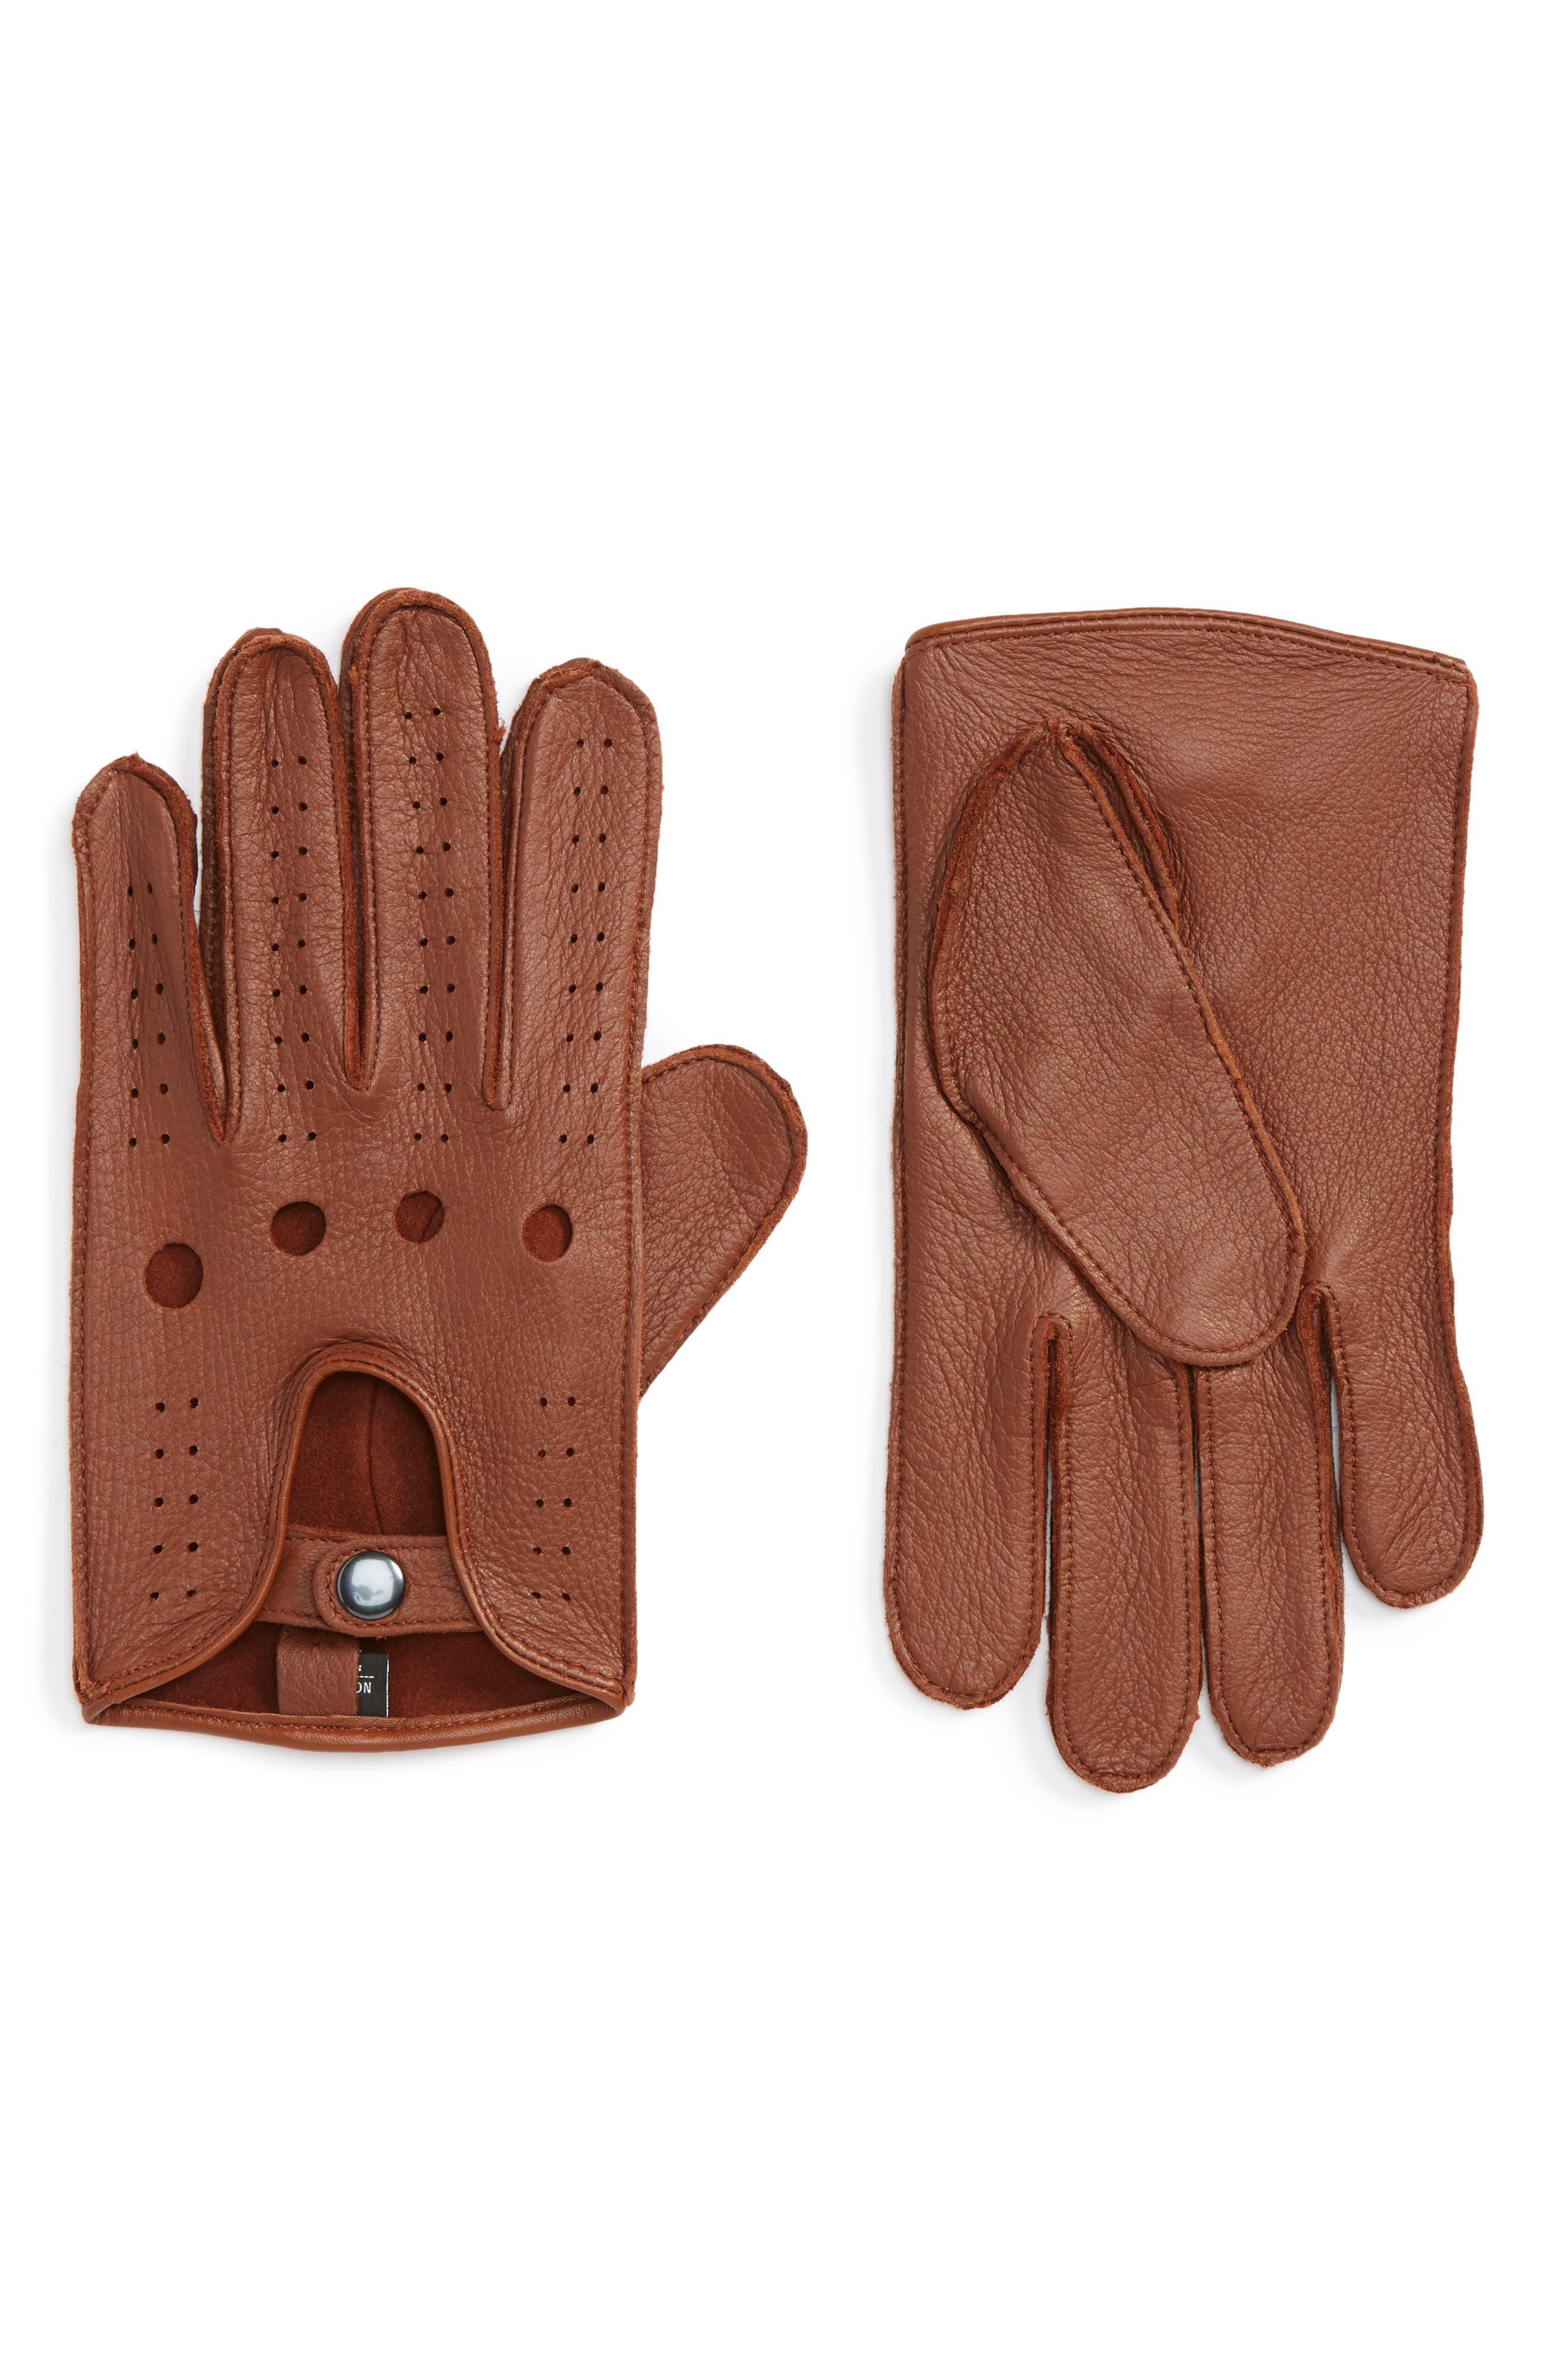 Main Image - Nordstrom Men's Shop Leather Driving Glove